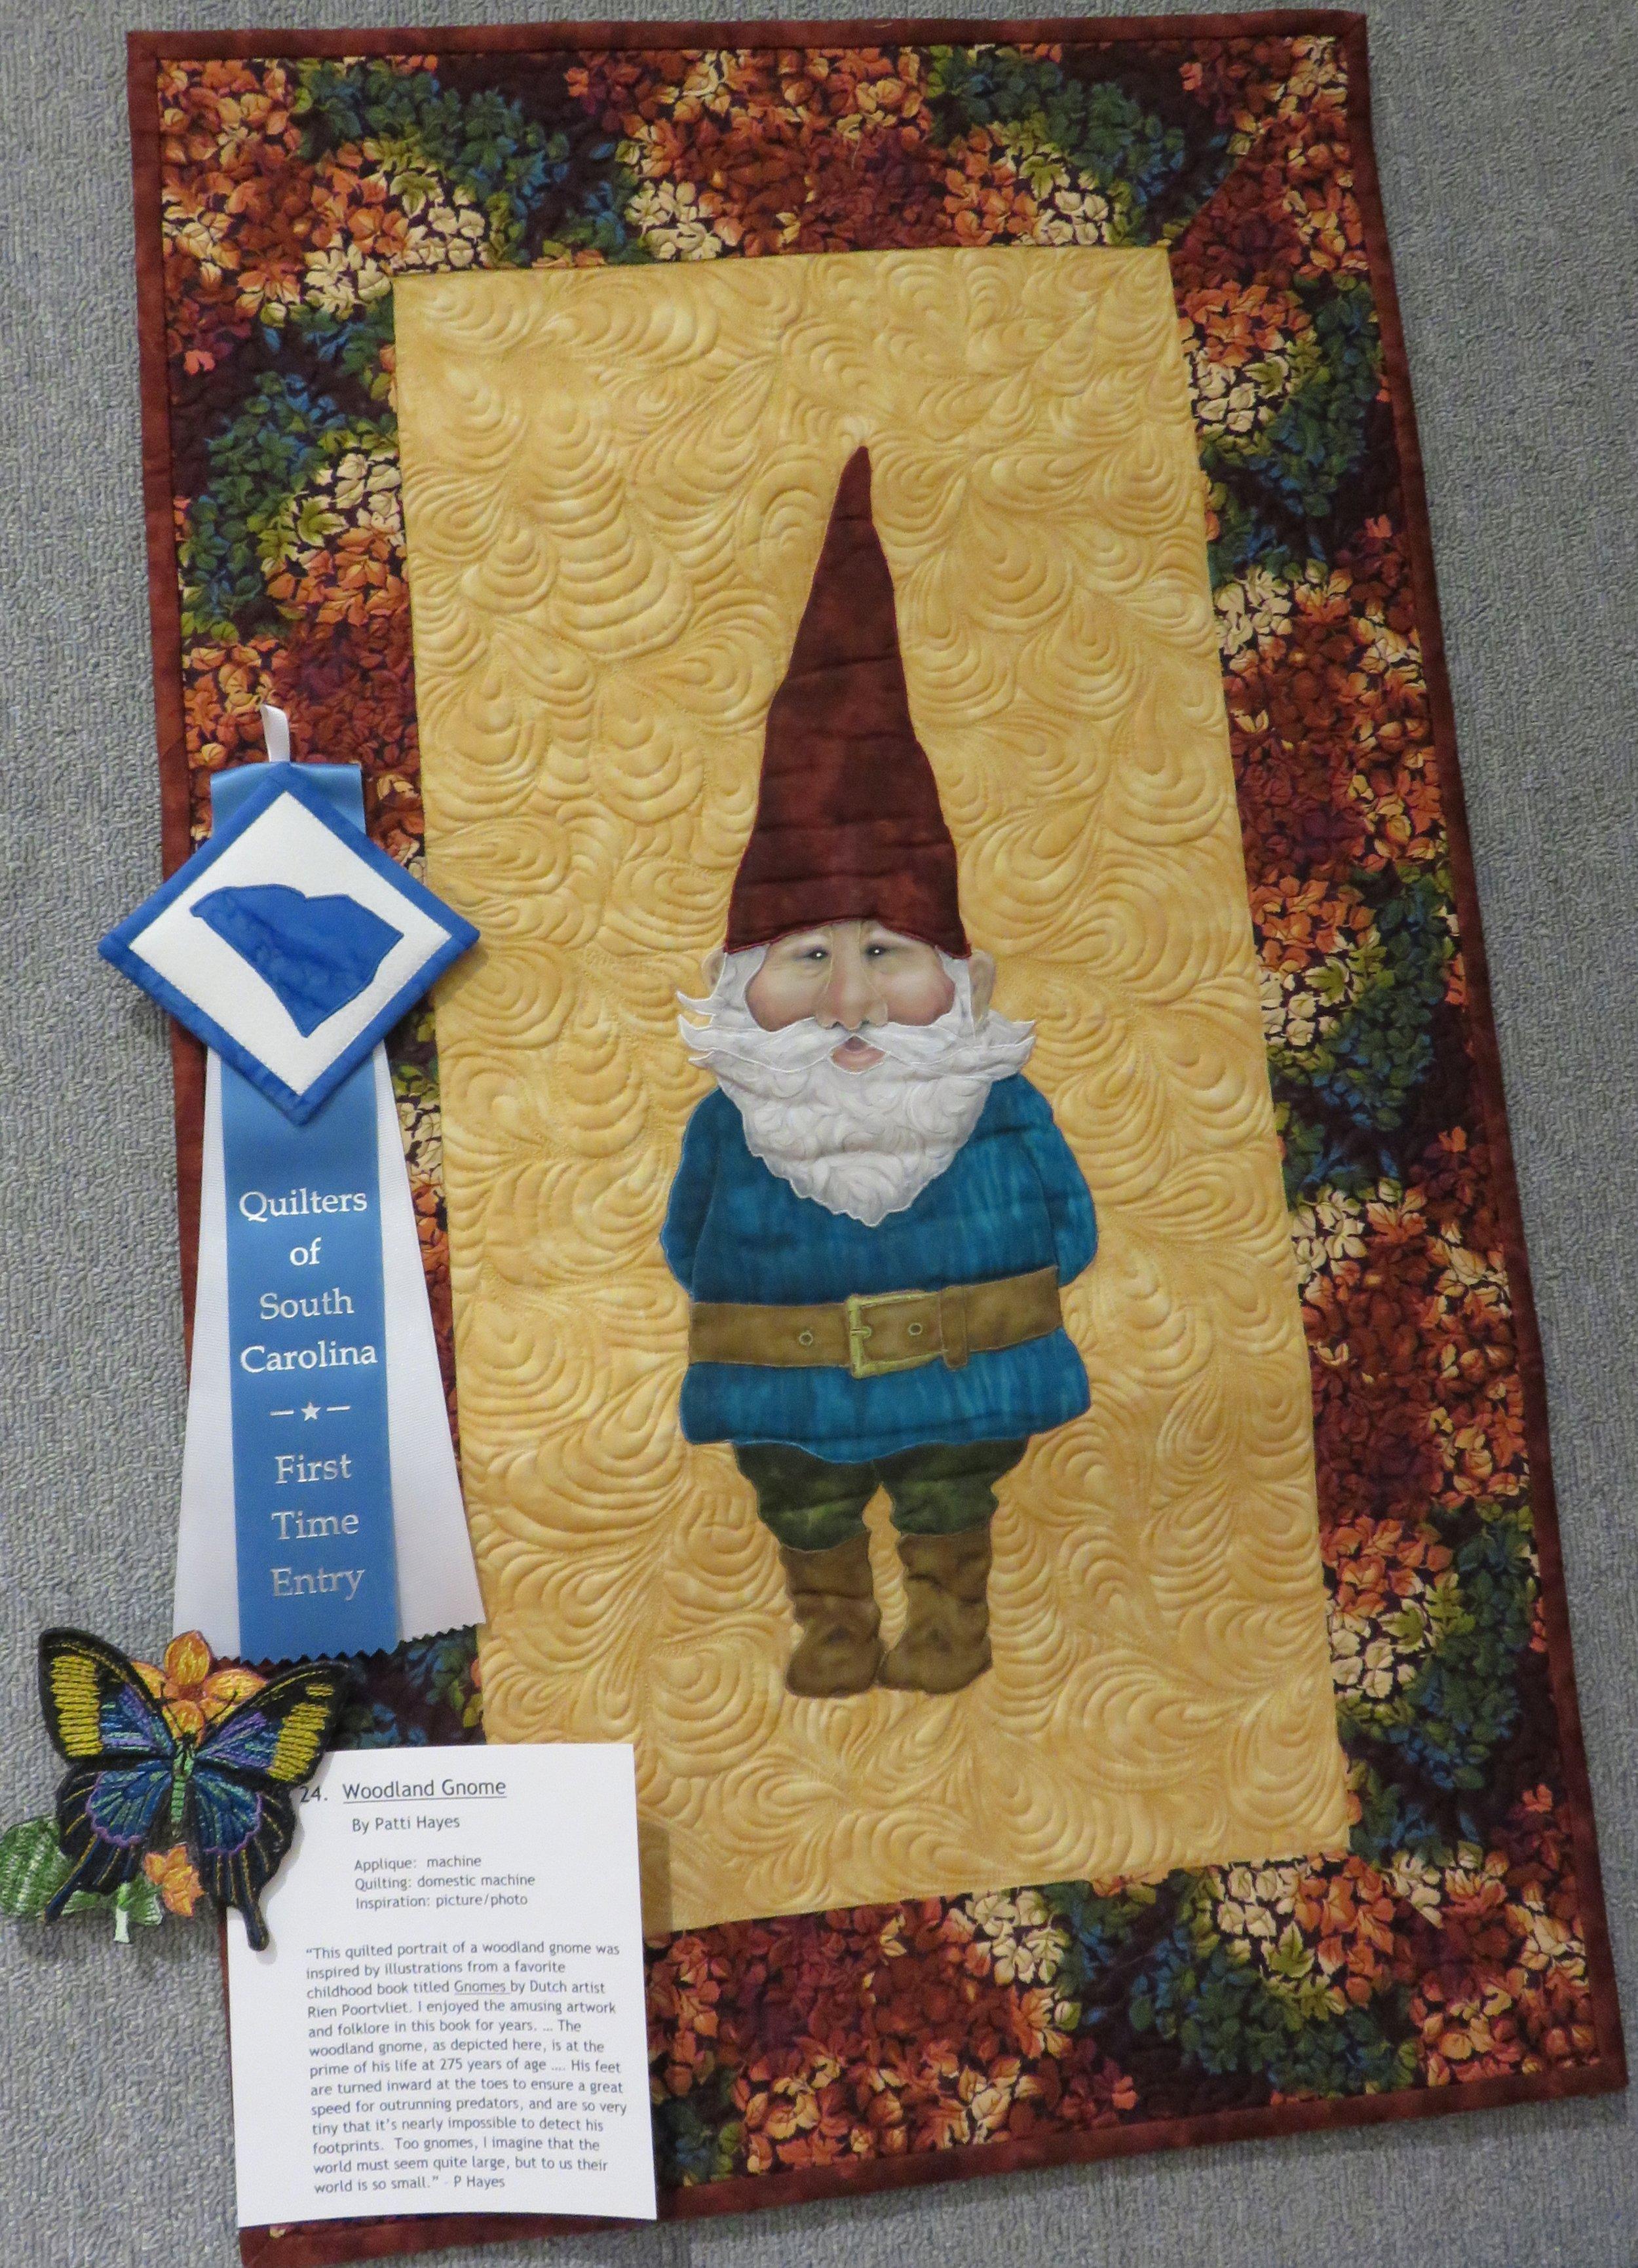 """Woodland Gnome"" sewn by Patti Hayes"